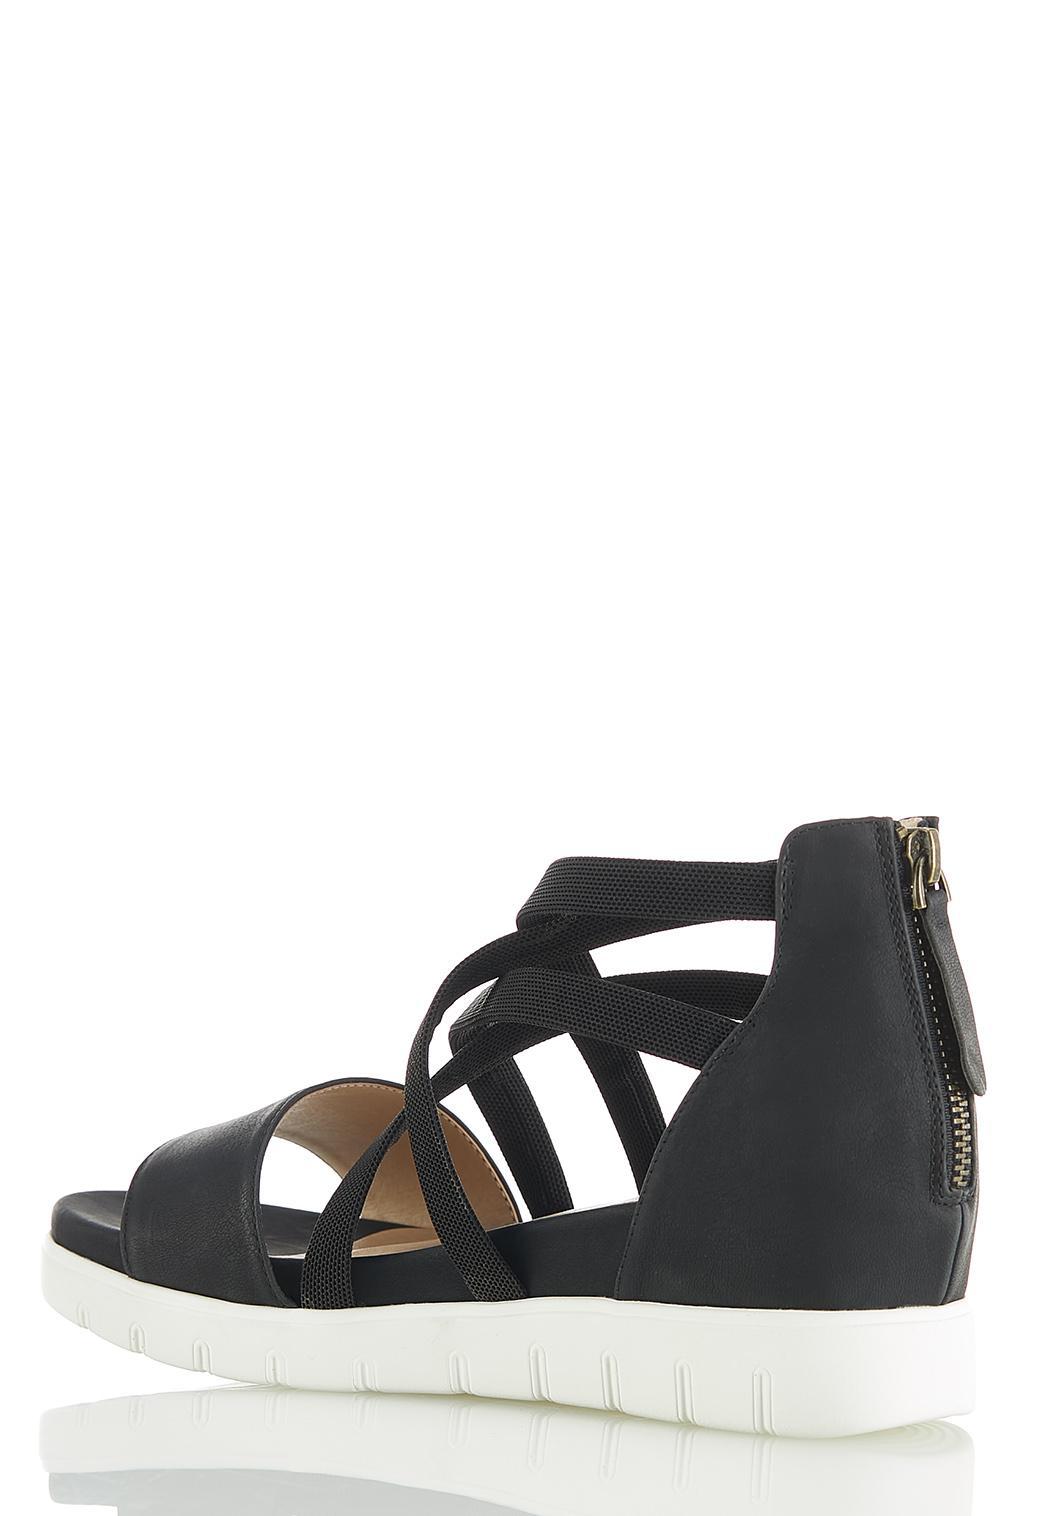 Wide Width Stretch Crossband Wedge Sandals (Item #44560900)